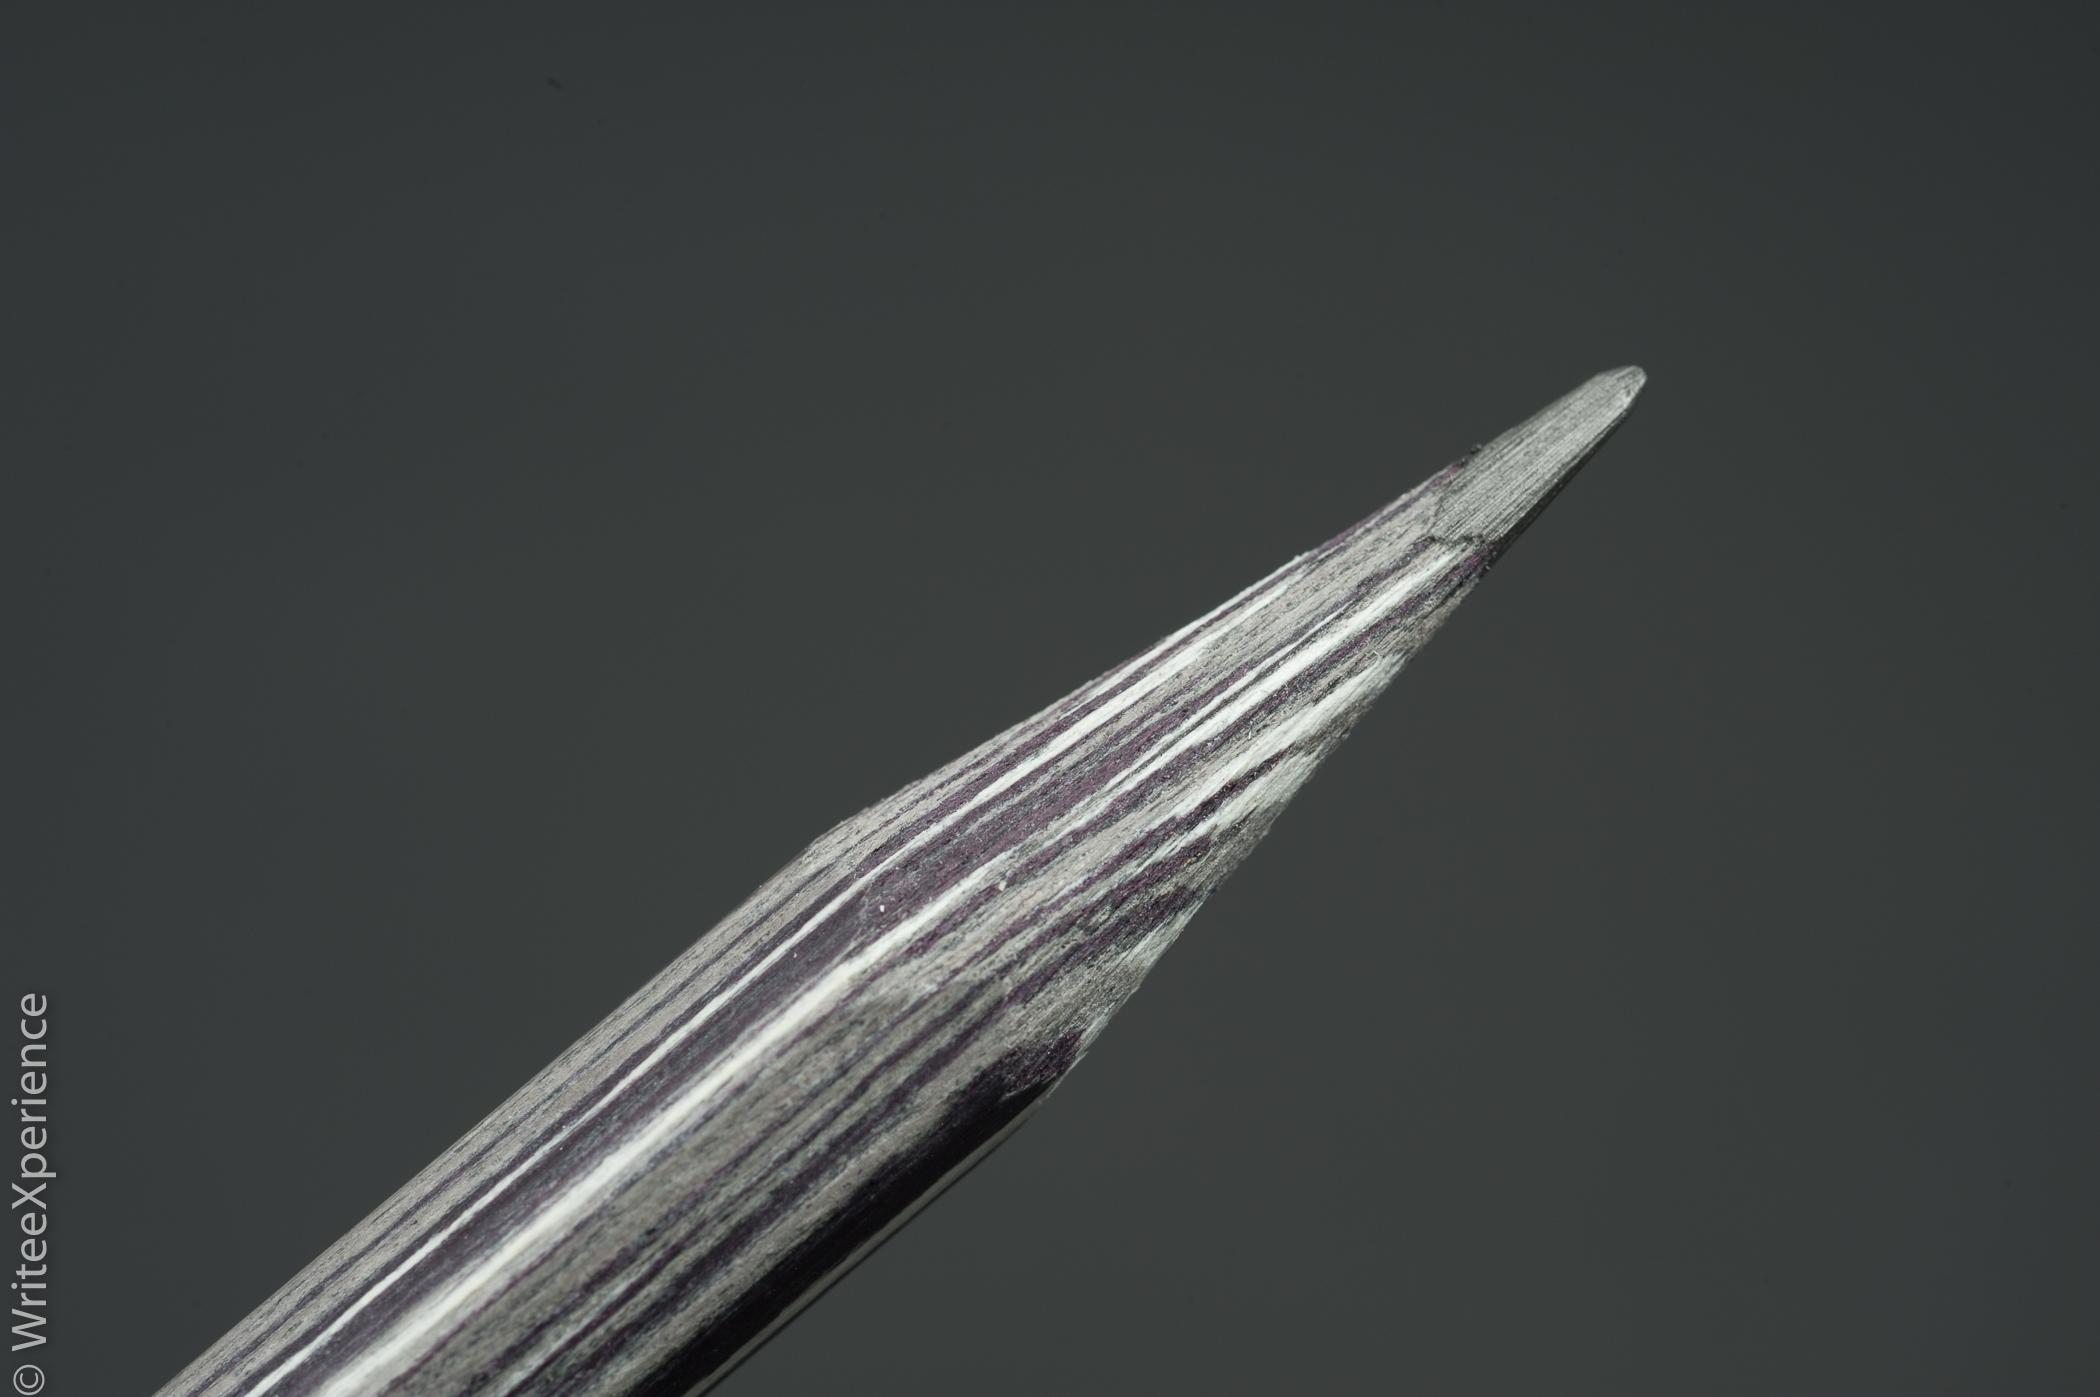 WriteeXperience-Caran-dache-noblewood-pencils-5th-15.jpg